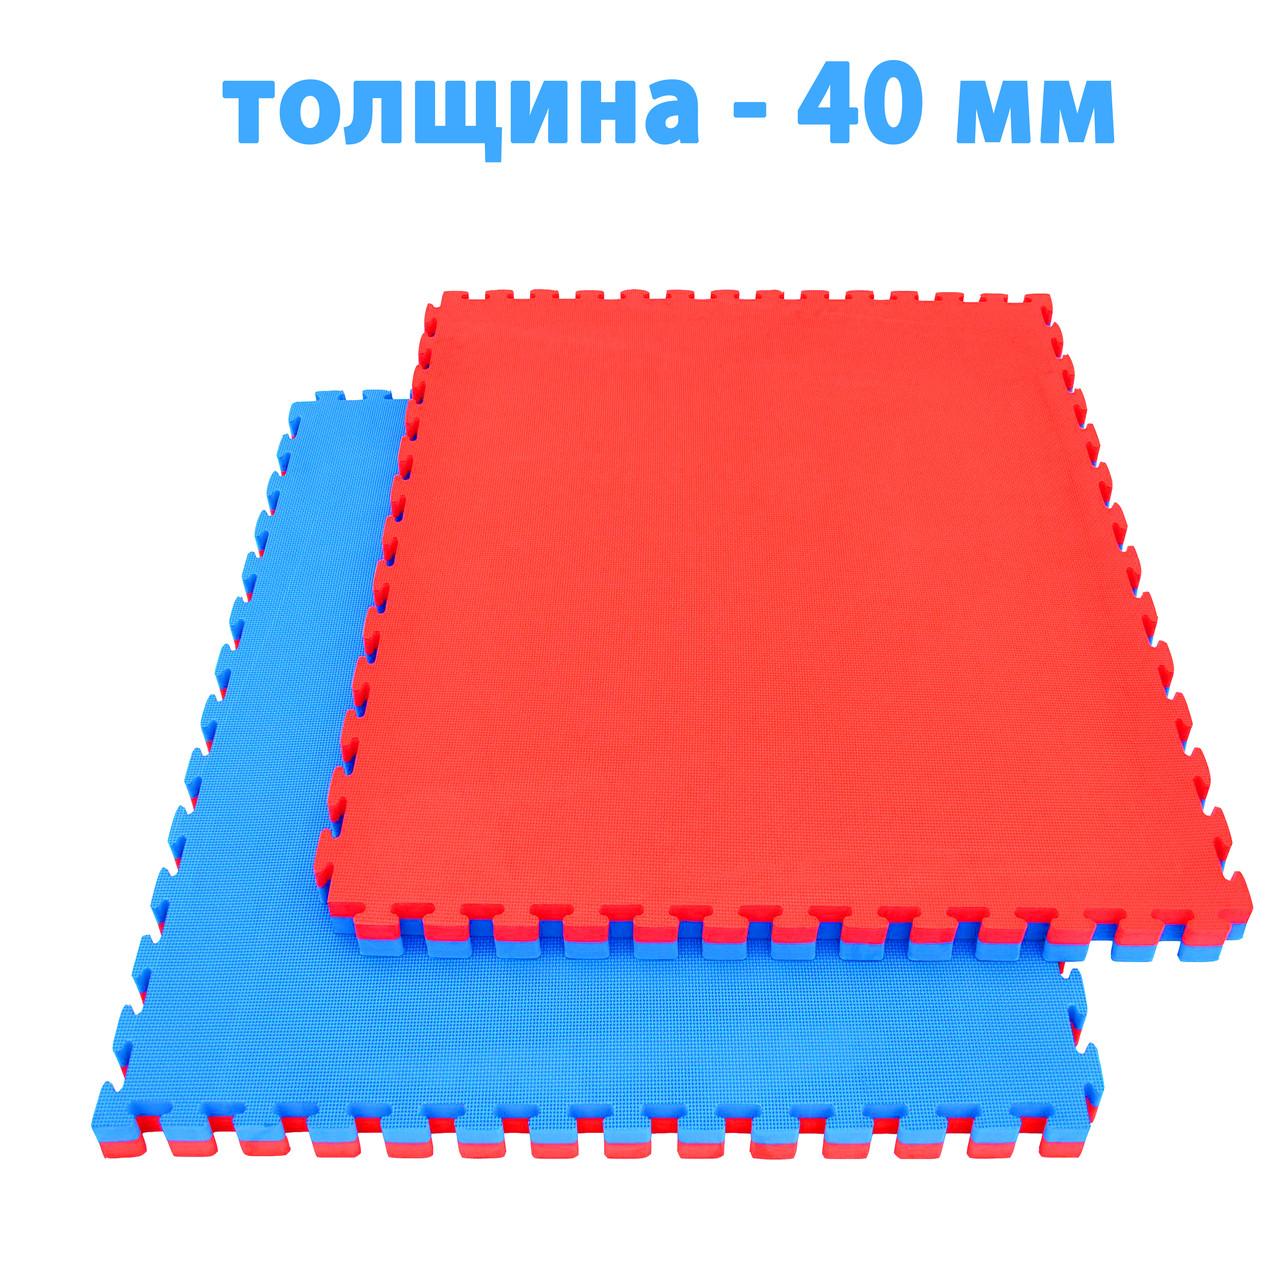 Спортивный мат (ТАТАМИ) 40 мм EVA (Турция), красно-синий